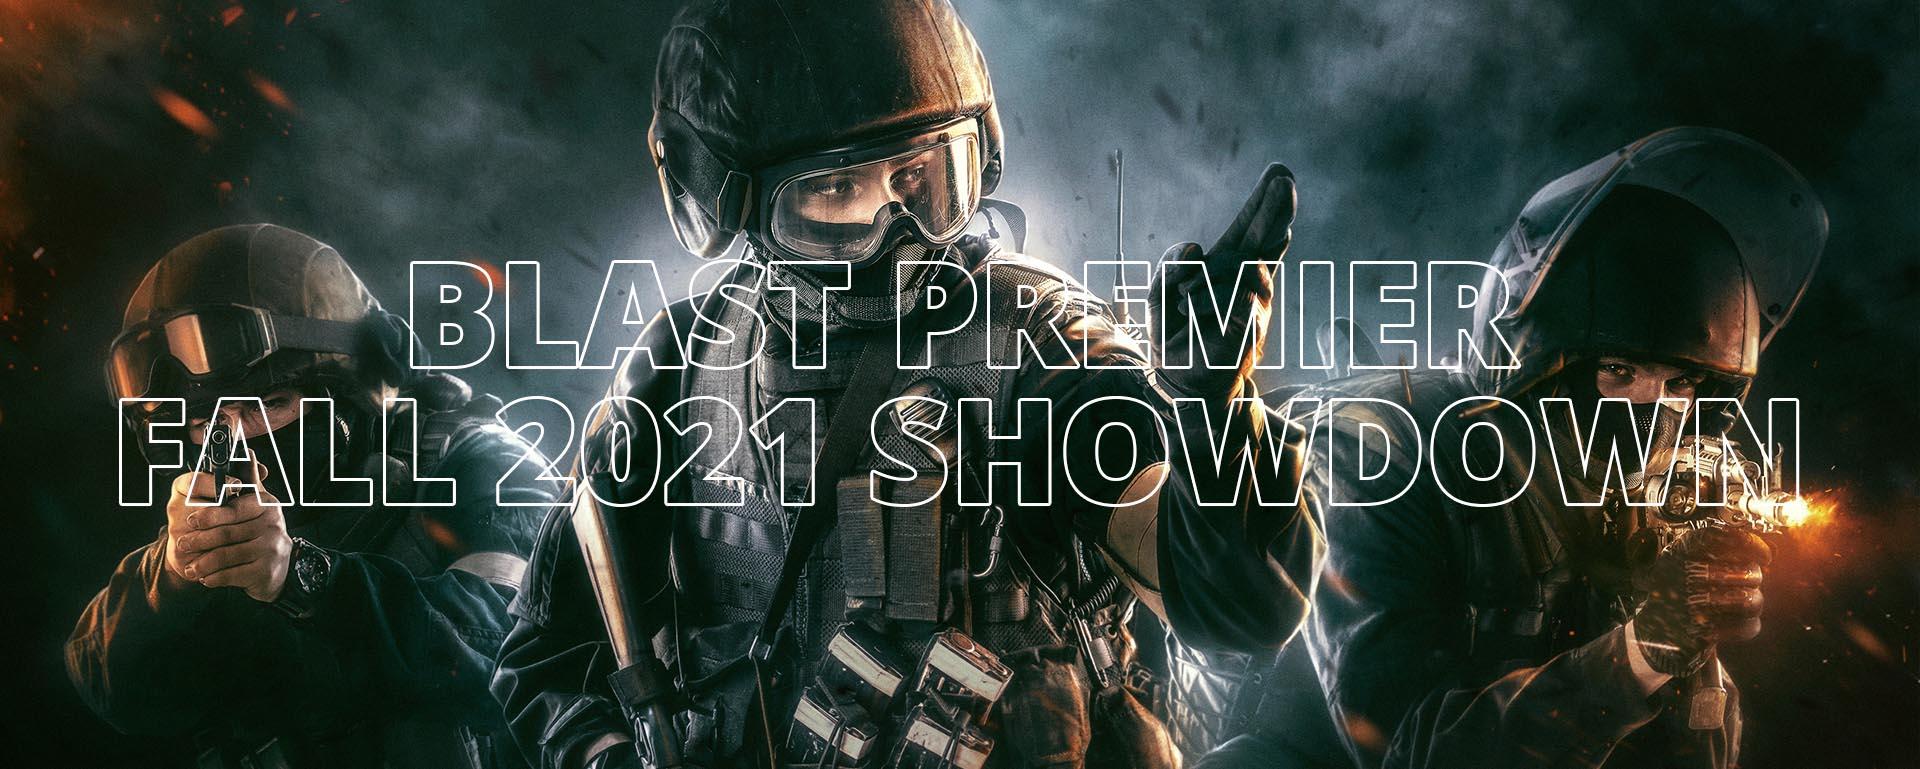 Blast Premier: Fall Showdown 2021